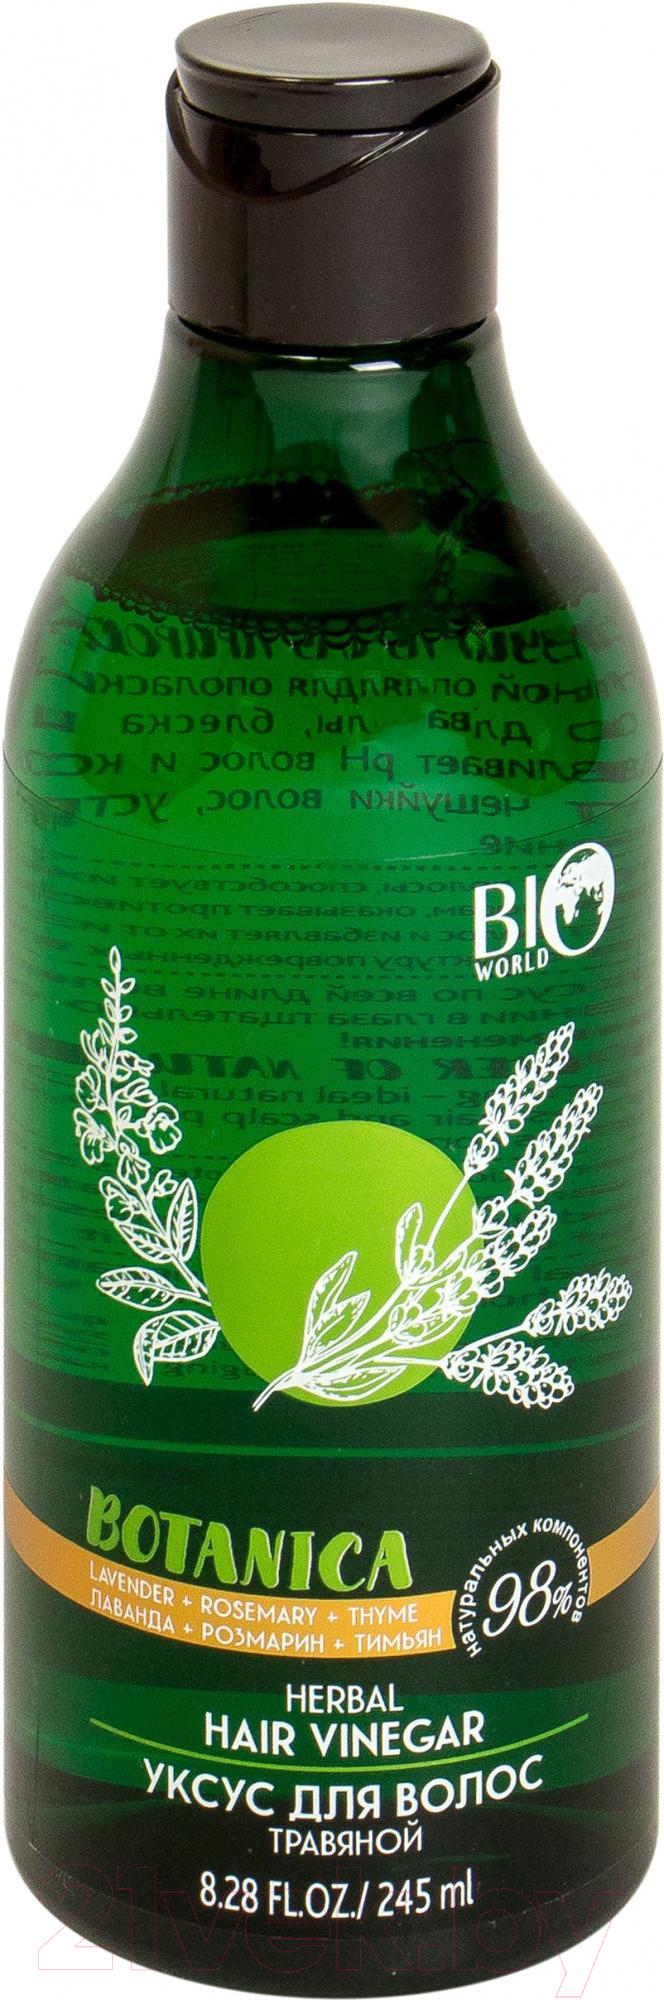 Купить Лосьон для волос Bio World, Botanica лаванда розмарин тимьян (245мл), Беларусь